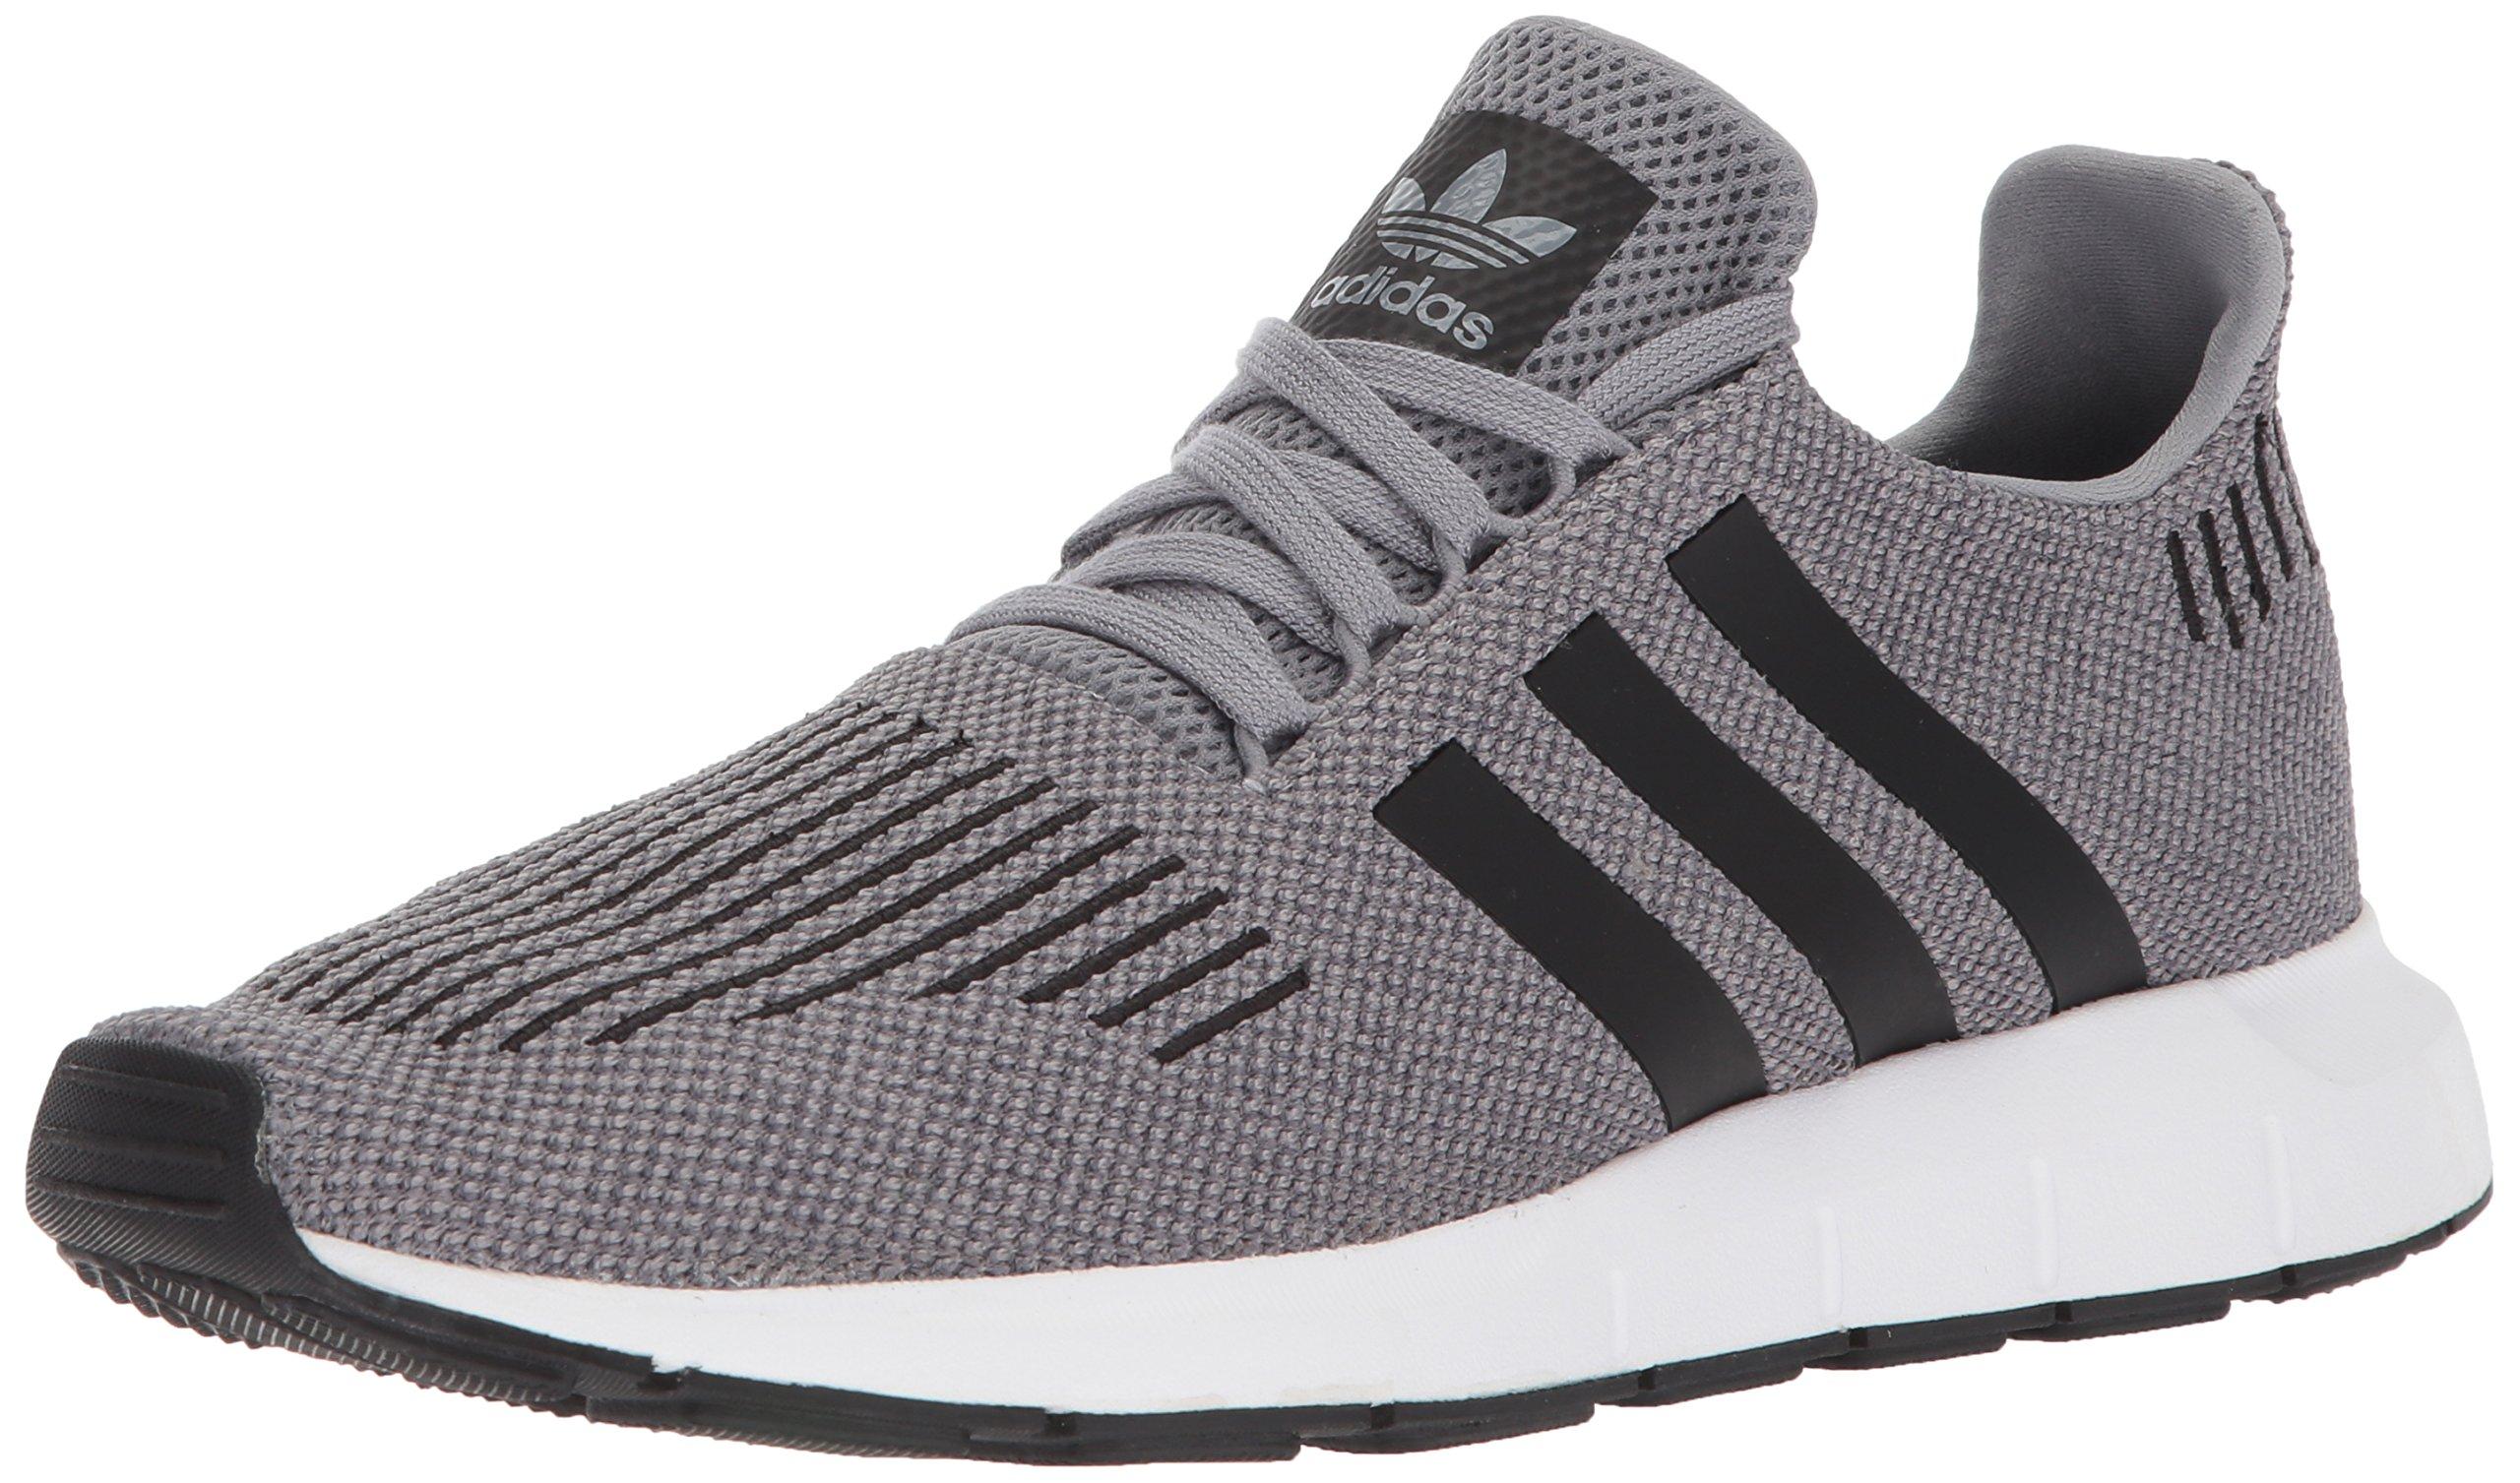 Galleon - Adidas Men s Swift Run Shoes ec6a3fd73d8